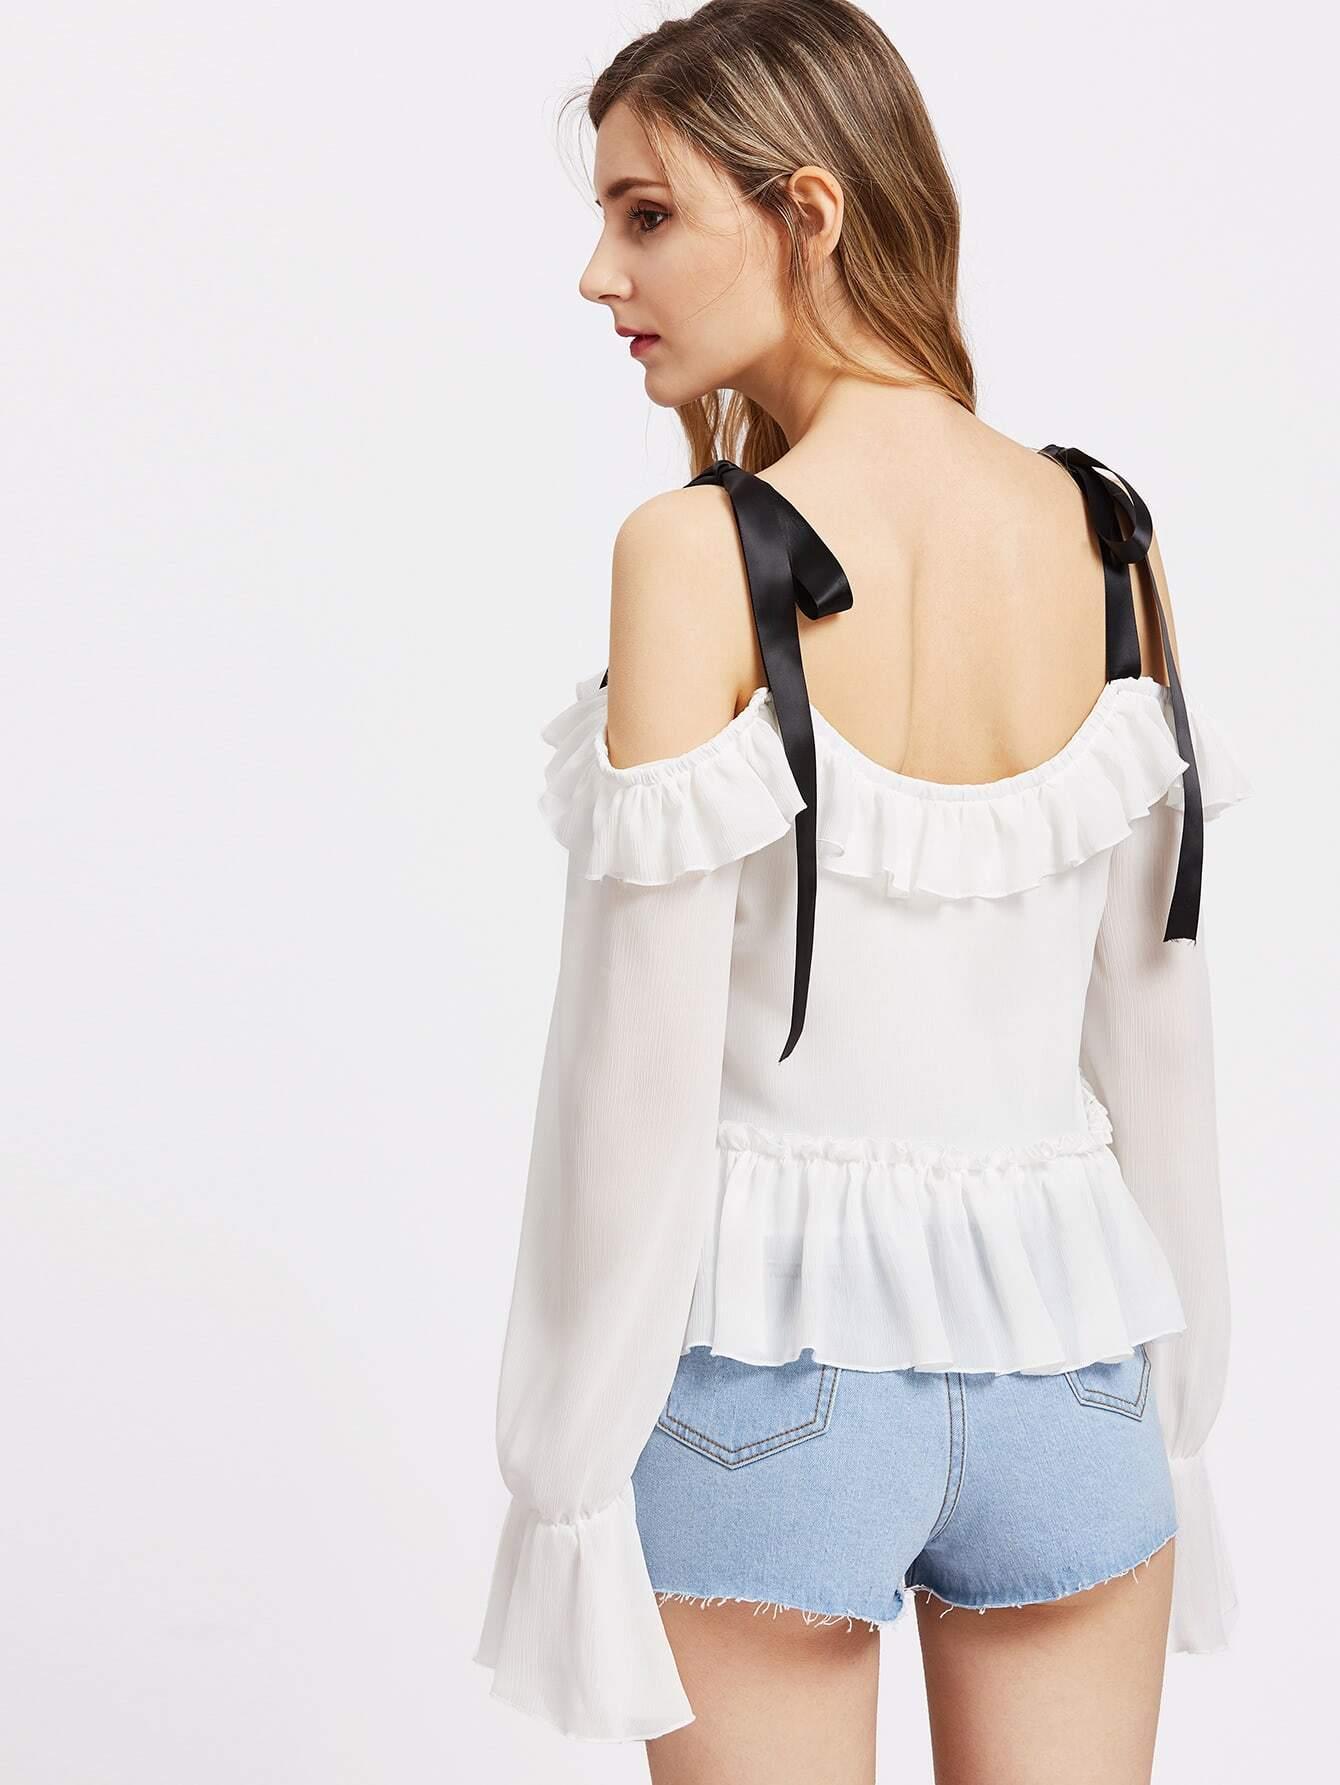 blouse170331453_2